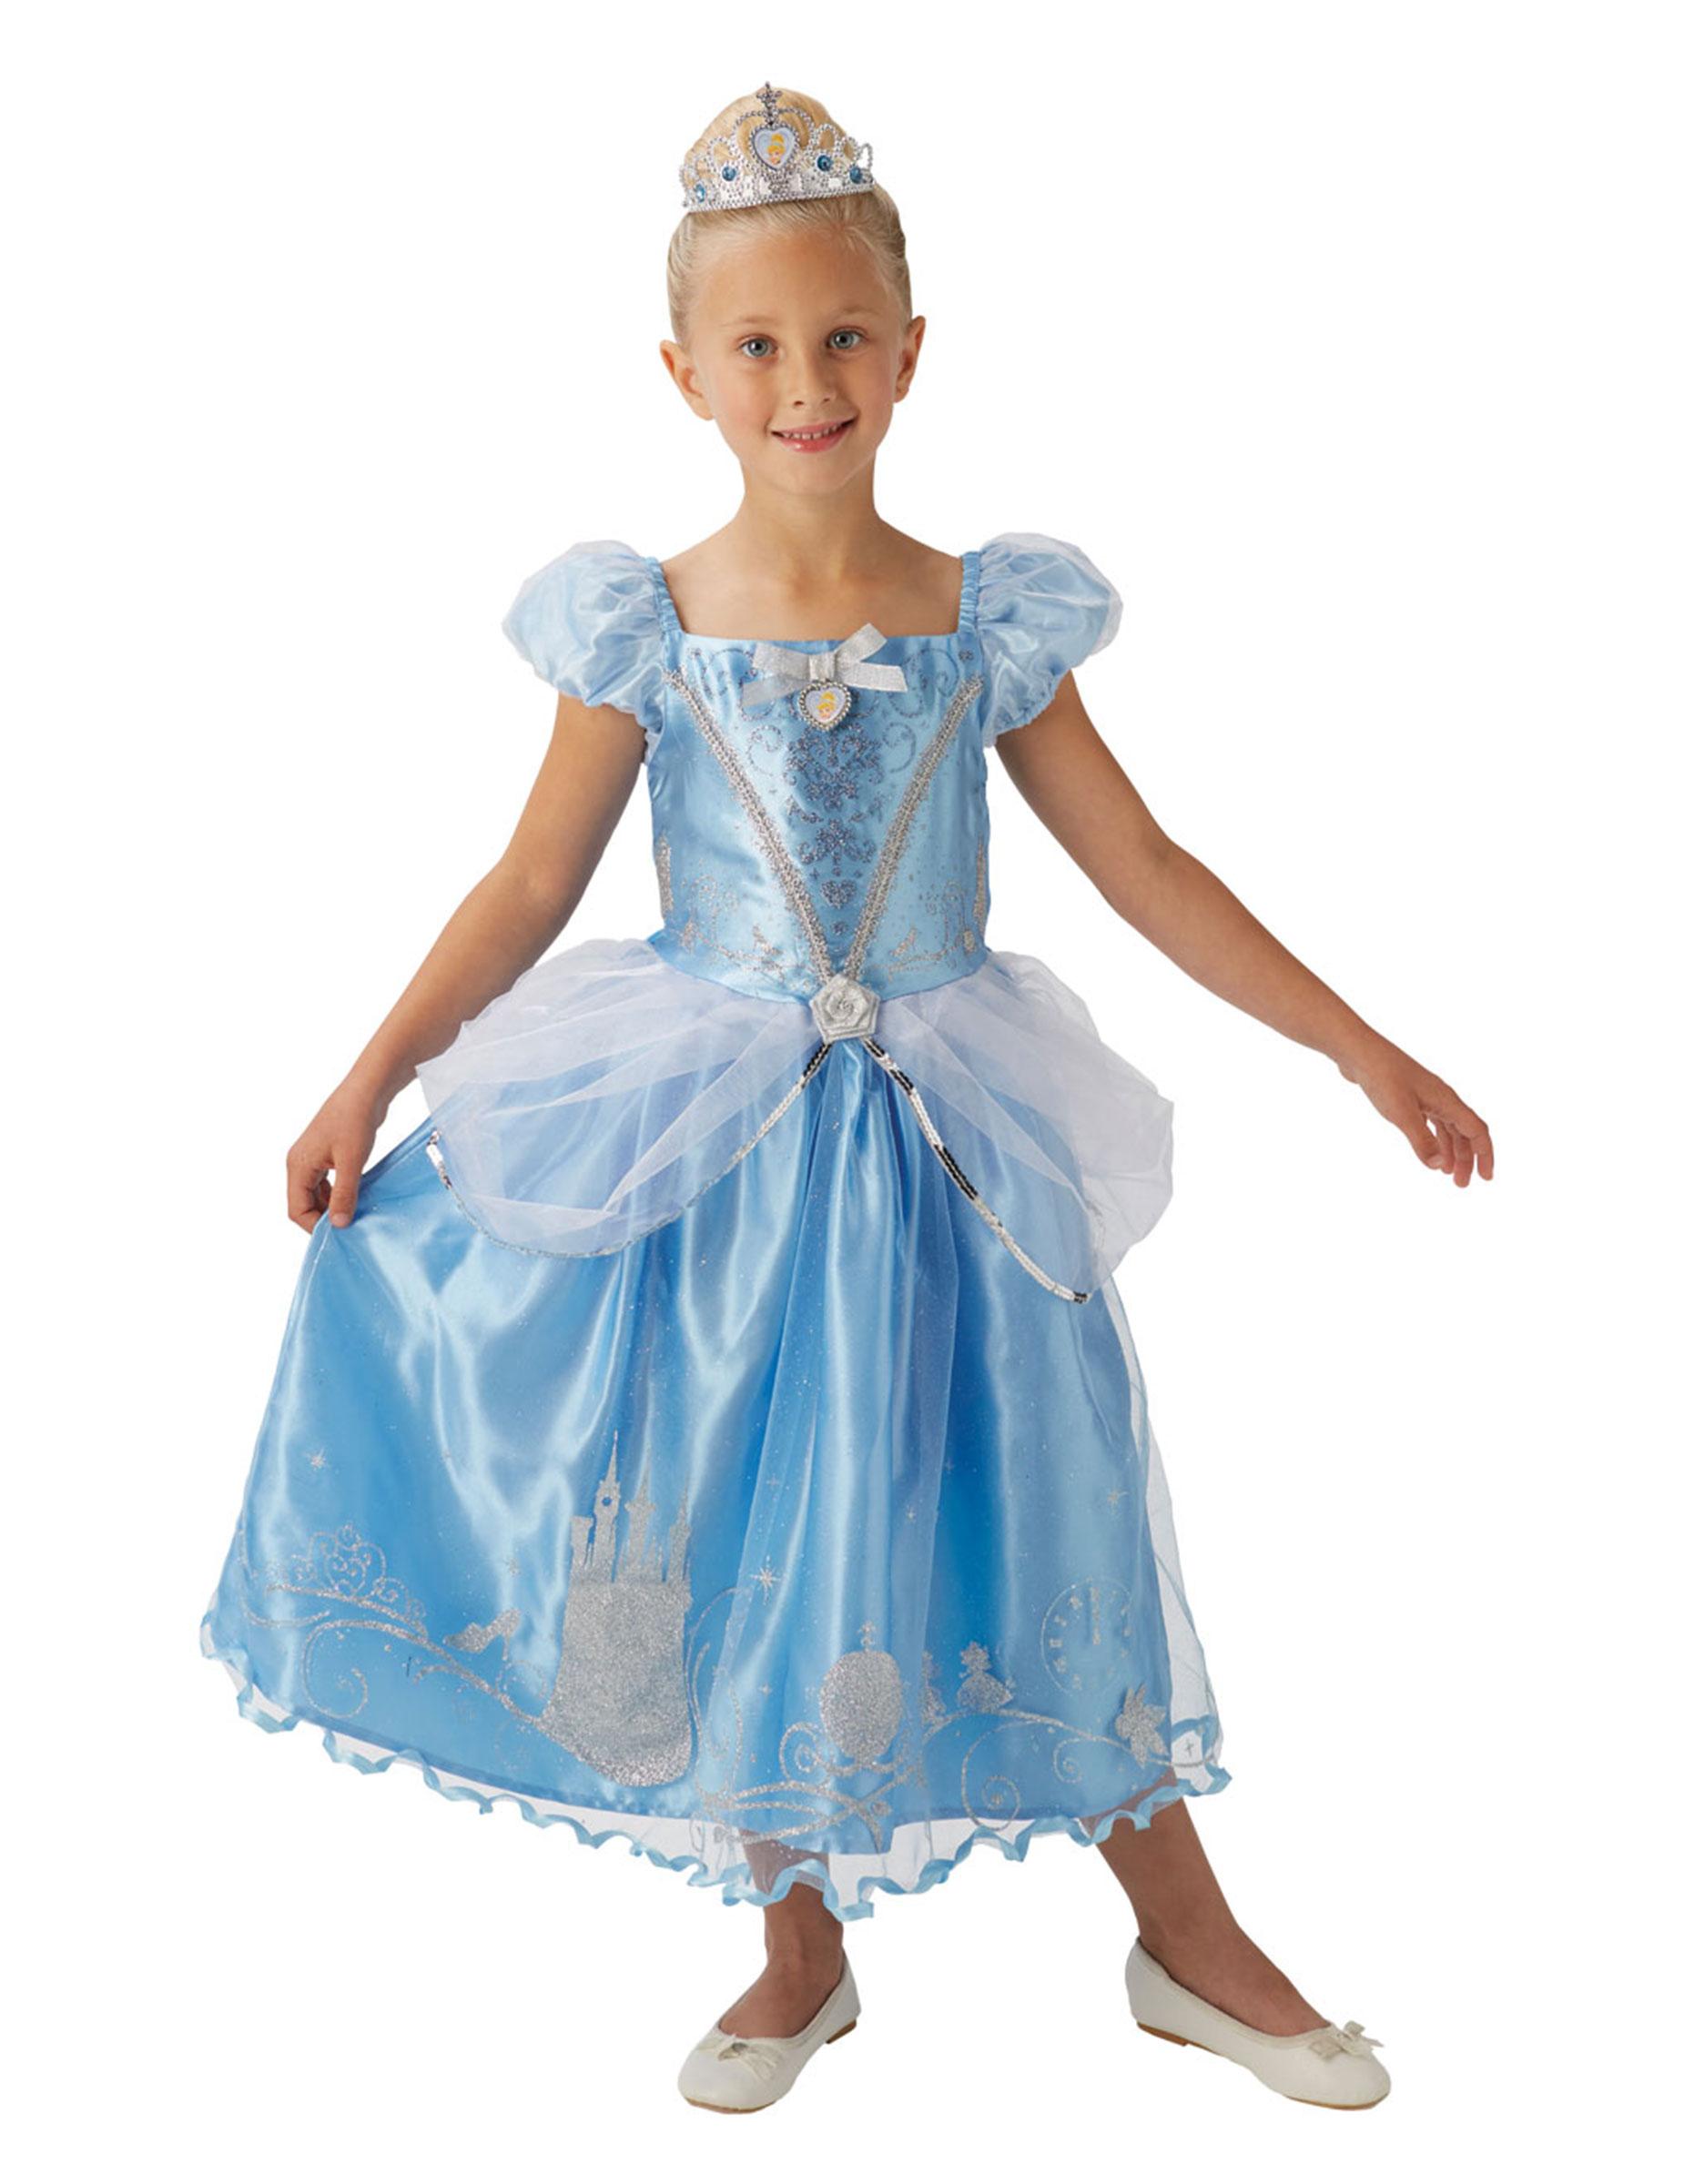 Travestimento da principessa Cenerentola™ con corona per bambina su ... ae67e56d3a1